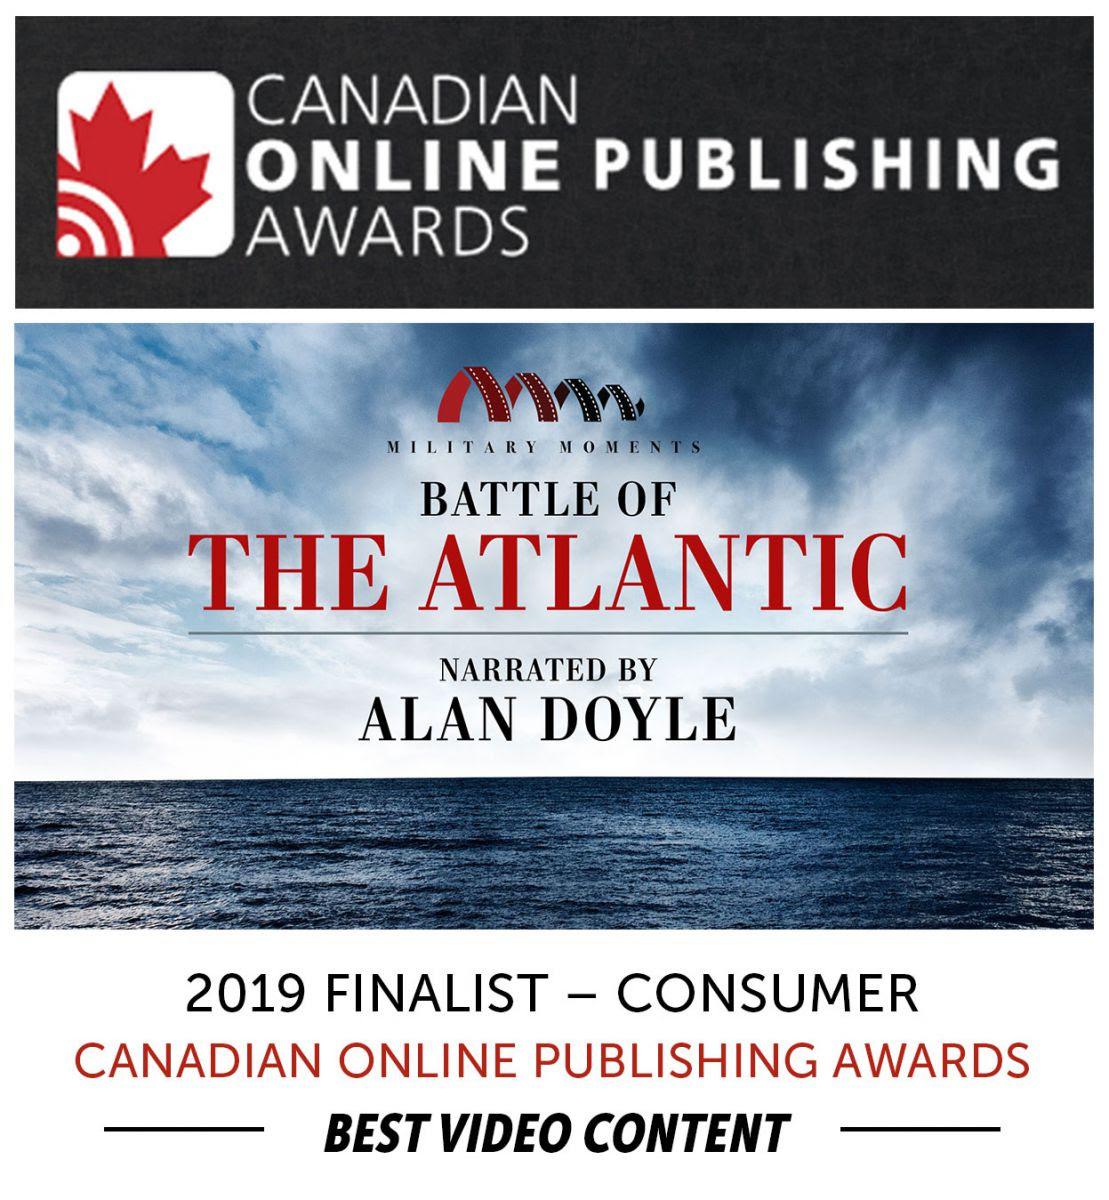 Alan Doyle Narrates Military Moments | Battle of the Atlantic